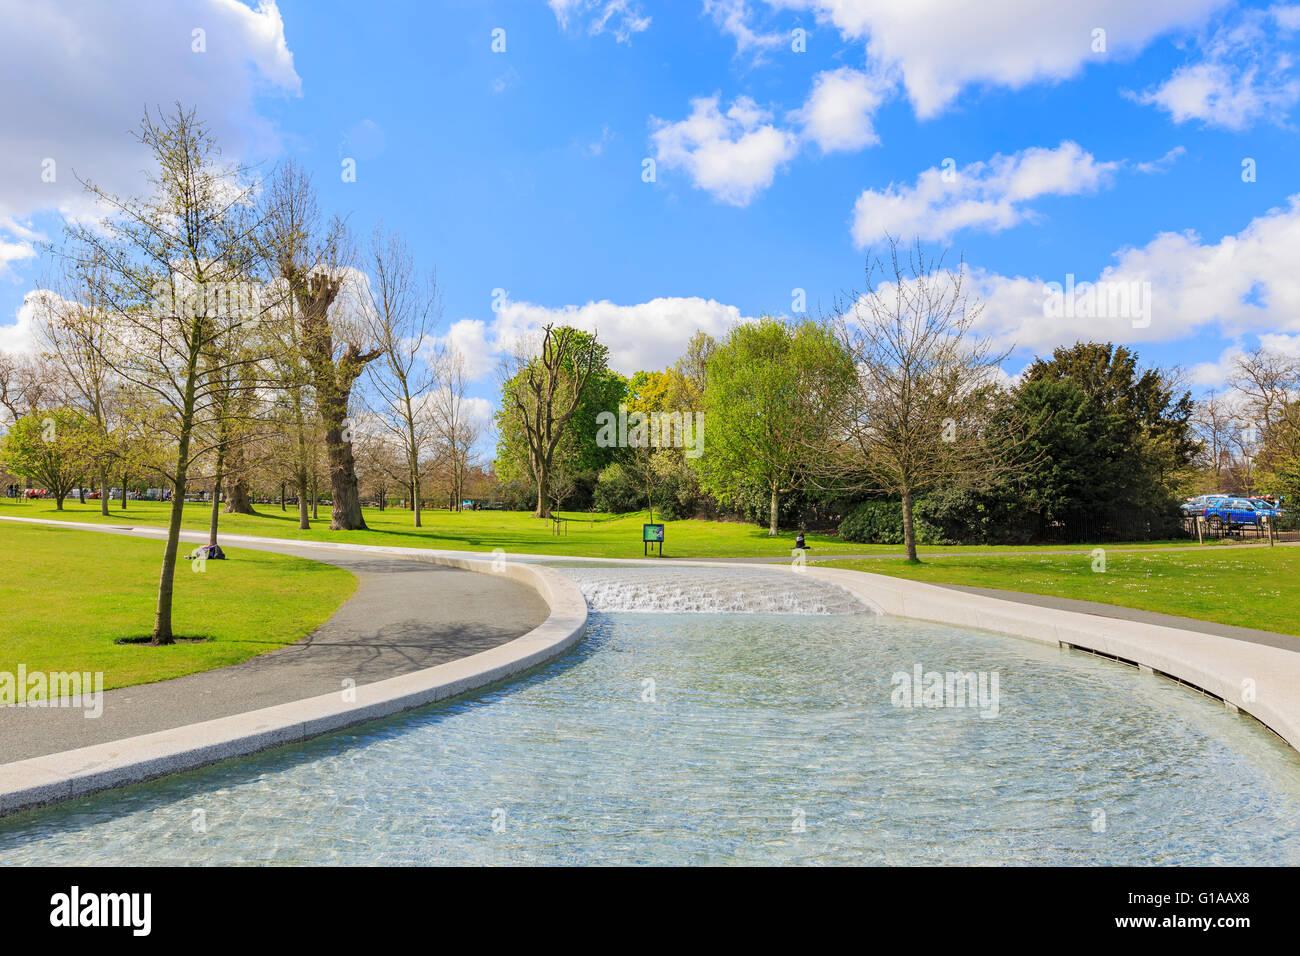 Princess Diana Memorial Fountain at Hyde Park, London, United Kingdom - Stock Image